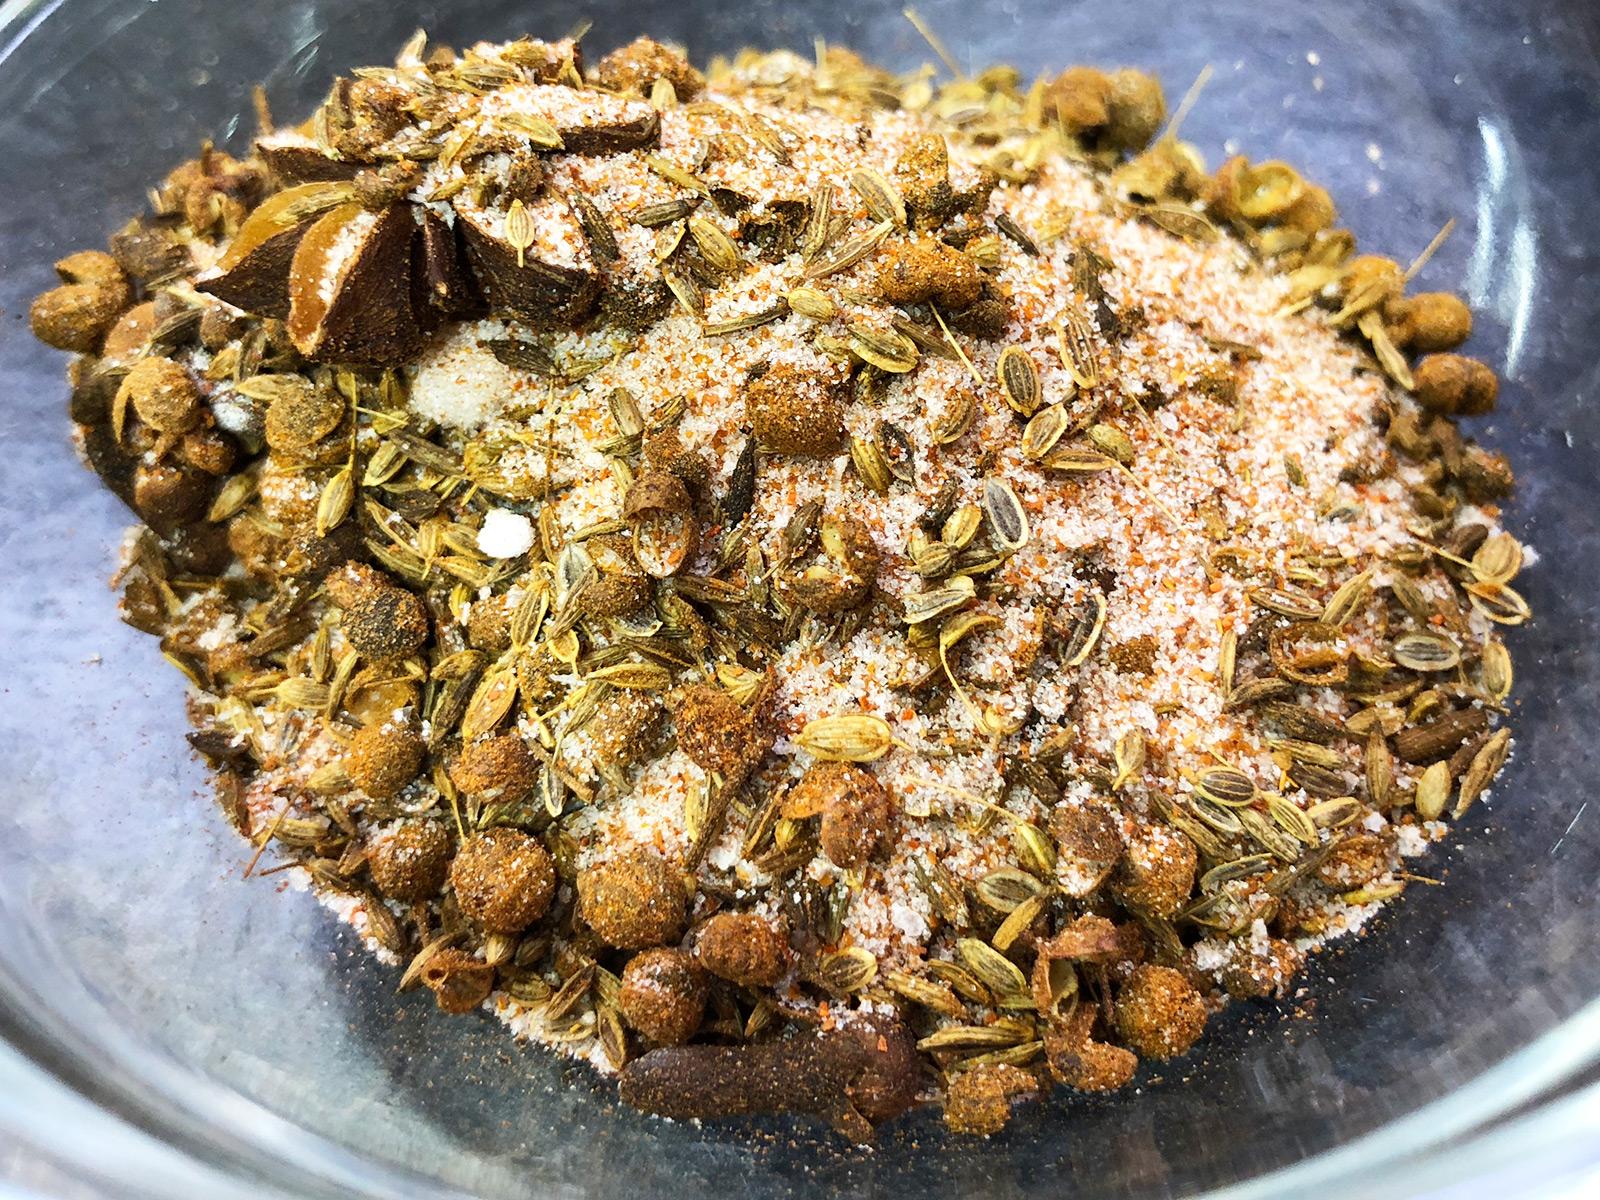 sichuan-spices.jpg